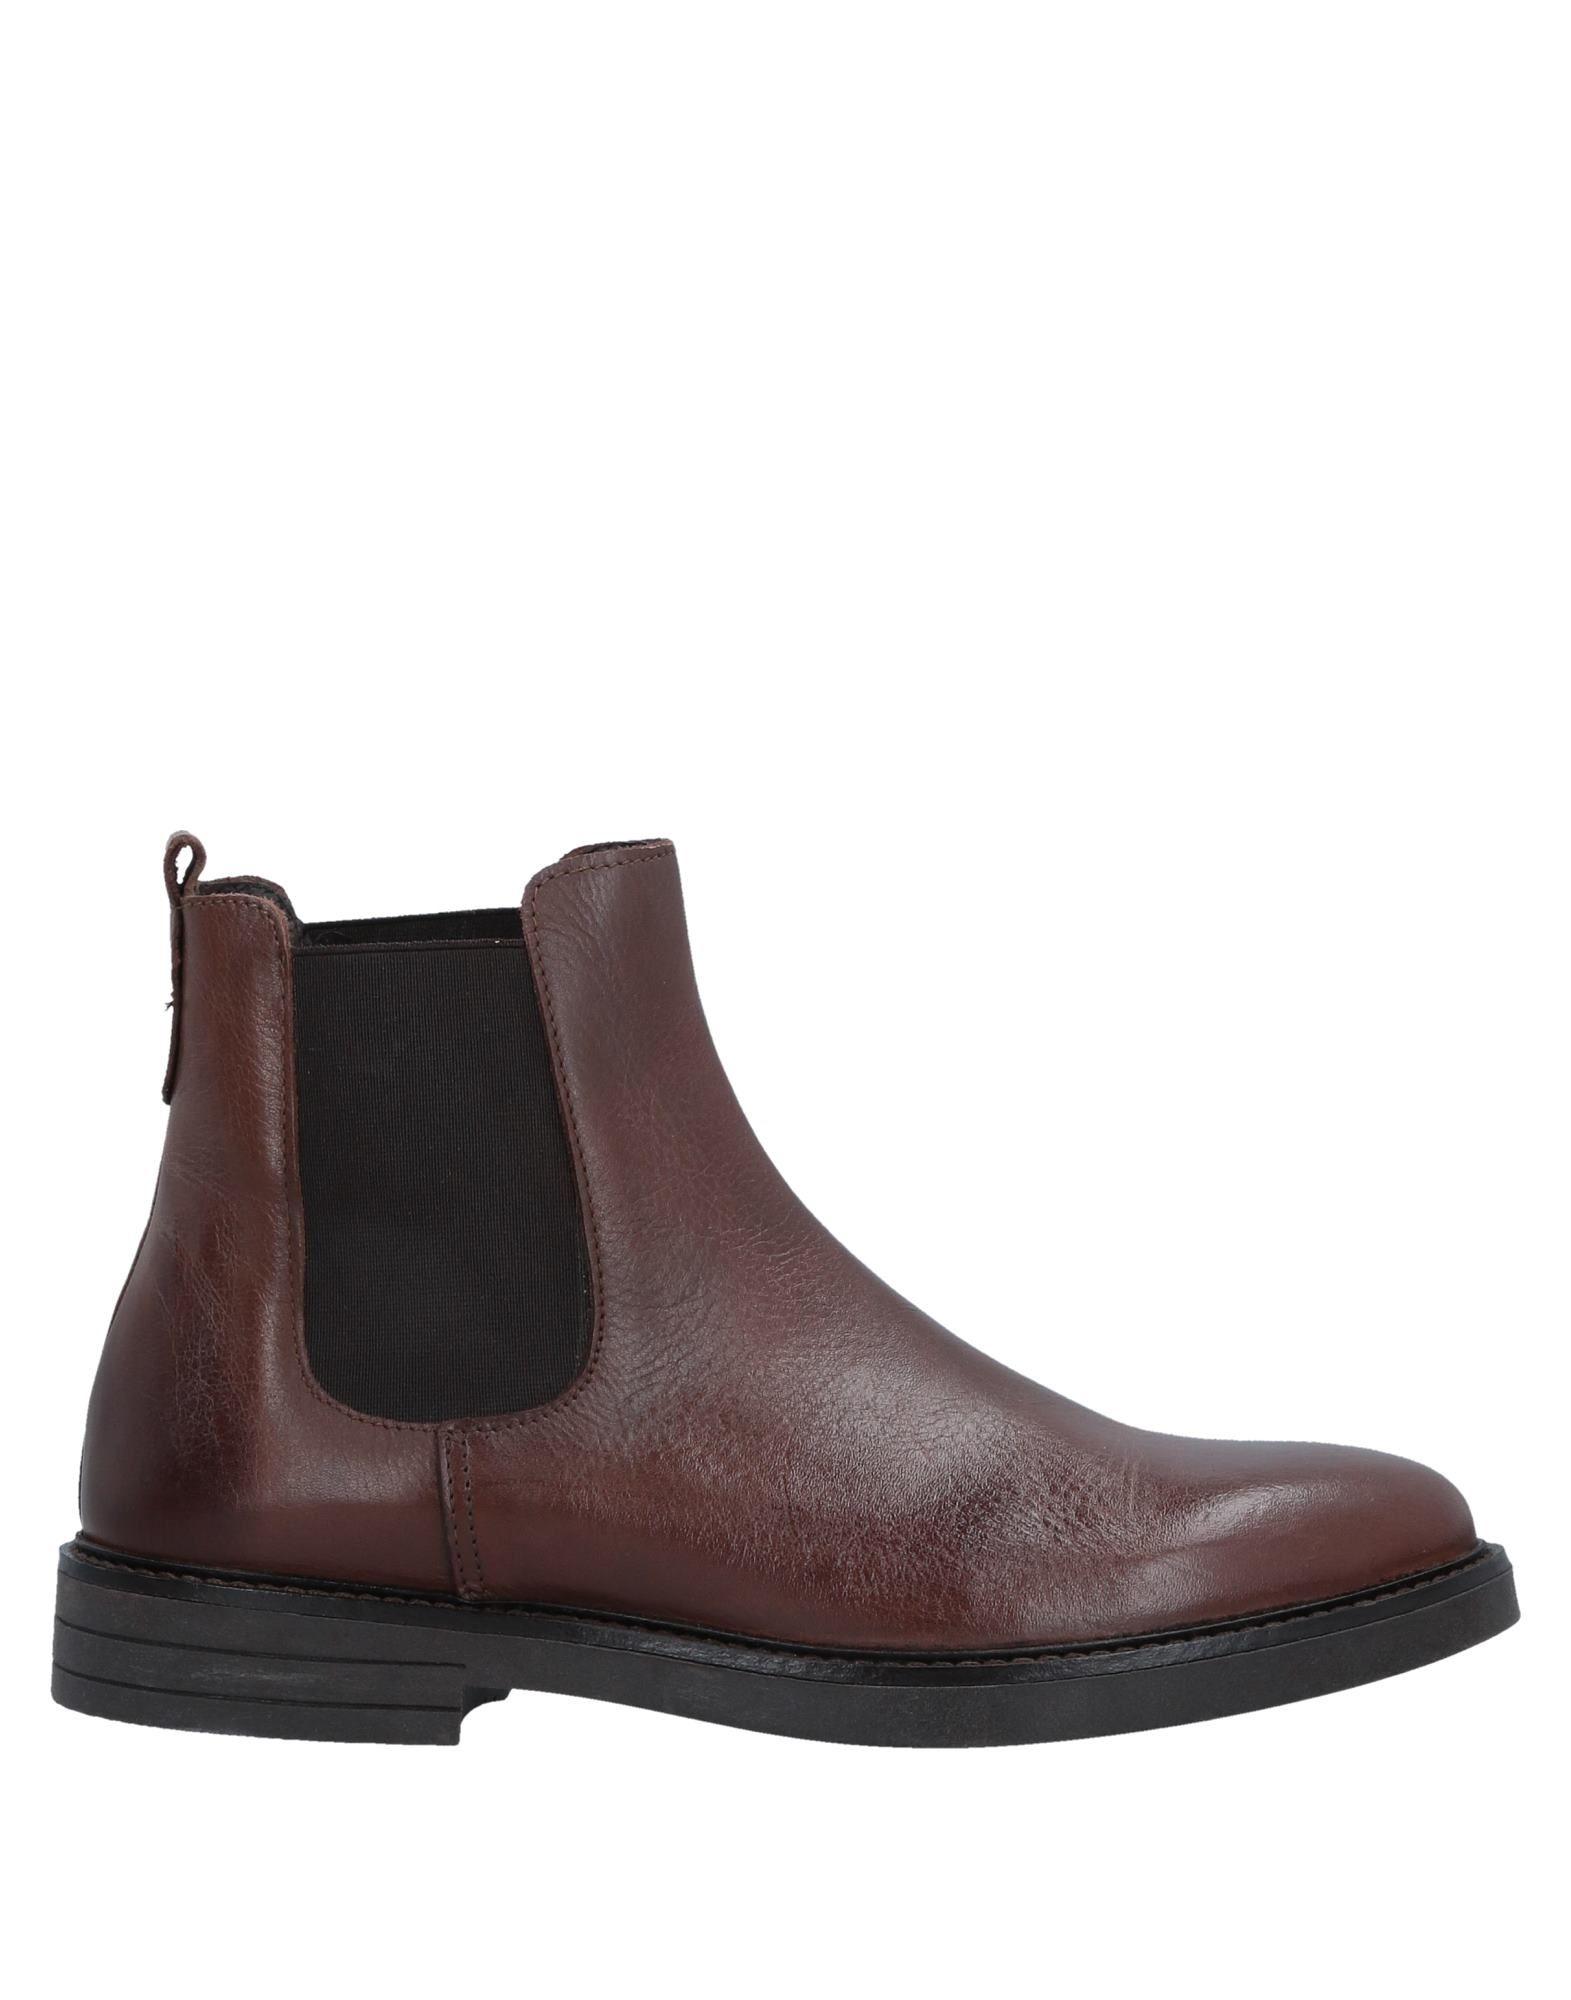 Rabatt echte Schuhe Roberto Della Croce Stiefelette Herren  11530003OK